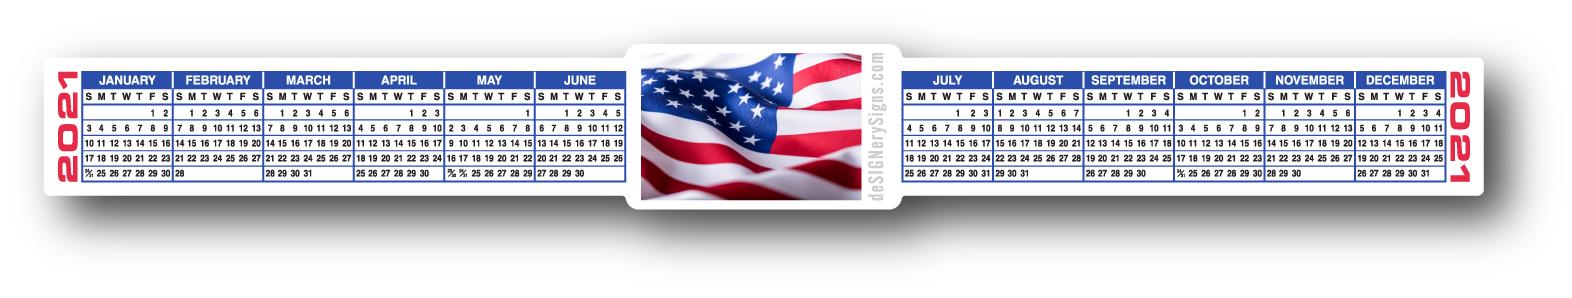 Keyboard Calendar Strips 2021 / See It Bigger Deskpad ...